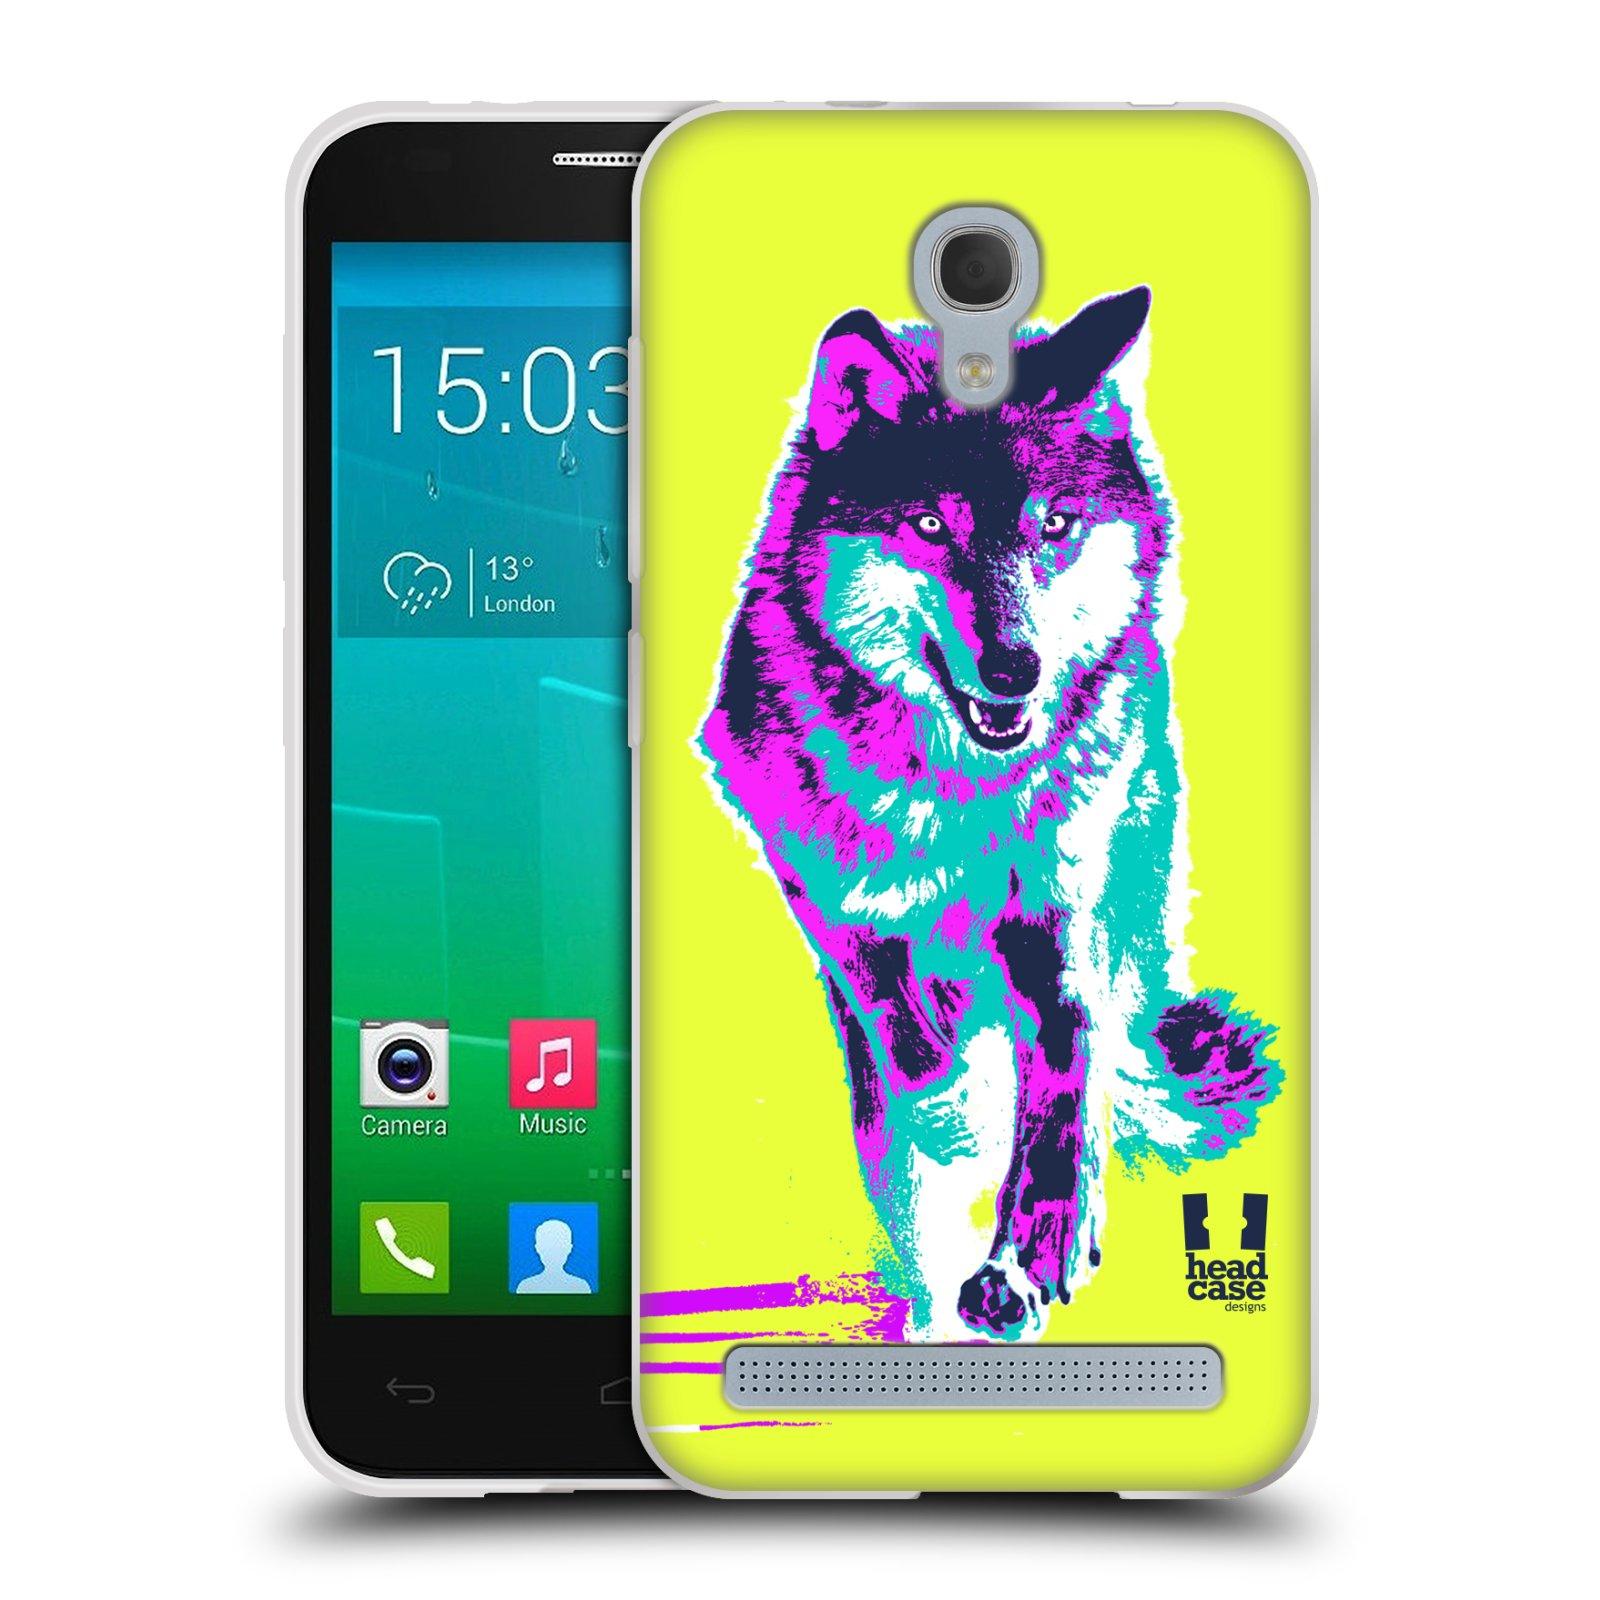 Silikonové pouzdro na mobil Alcatel One Touch Idol 2 Mini S 6036Y HEAD CASE POP PRINT VLK (Silikonový kryt či obal na mobilní telefon Alcatel Idol 2 Mini S OT-6036Y)